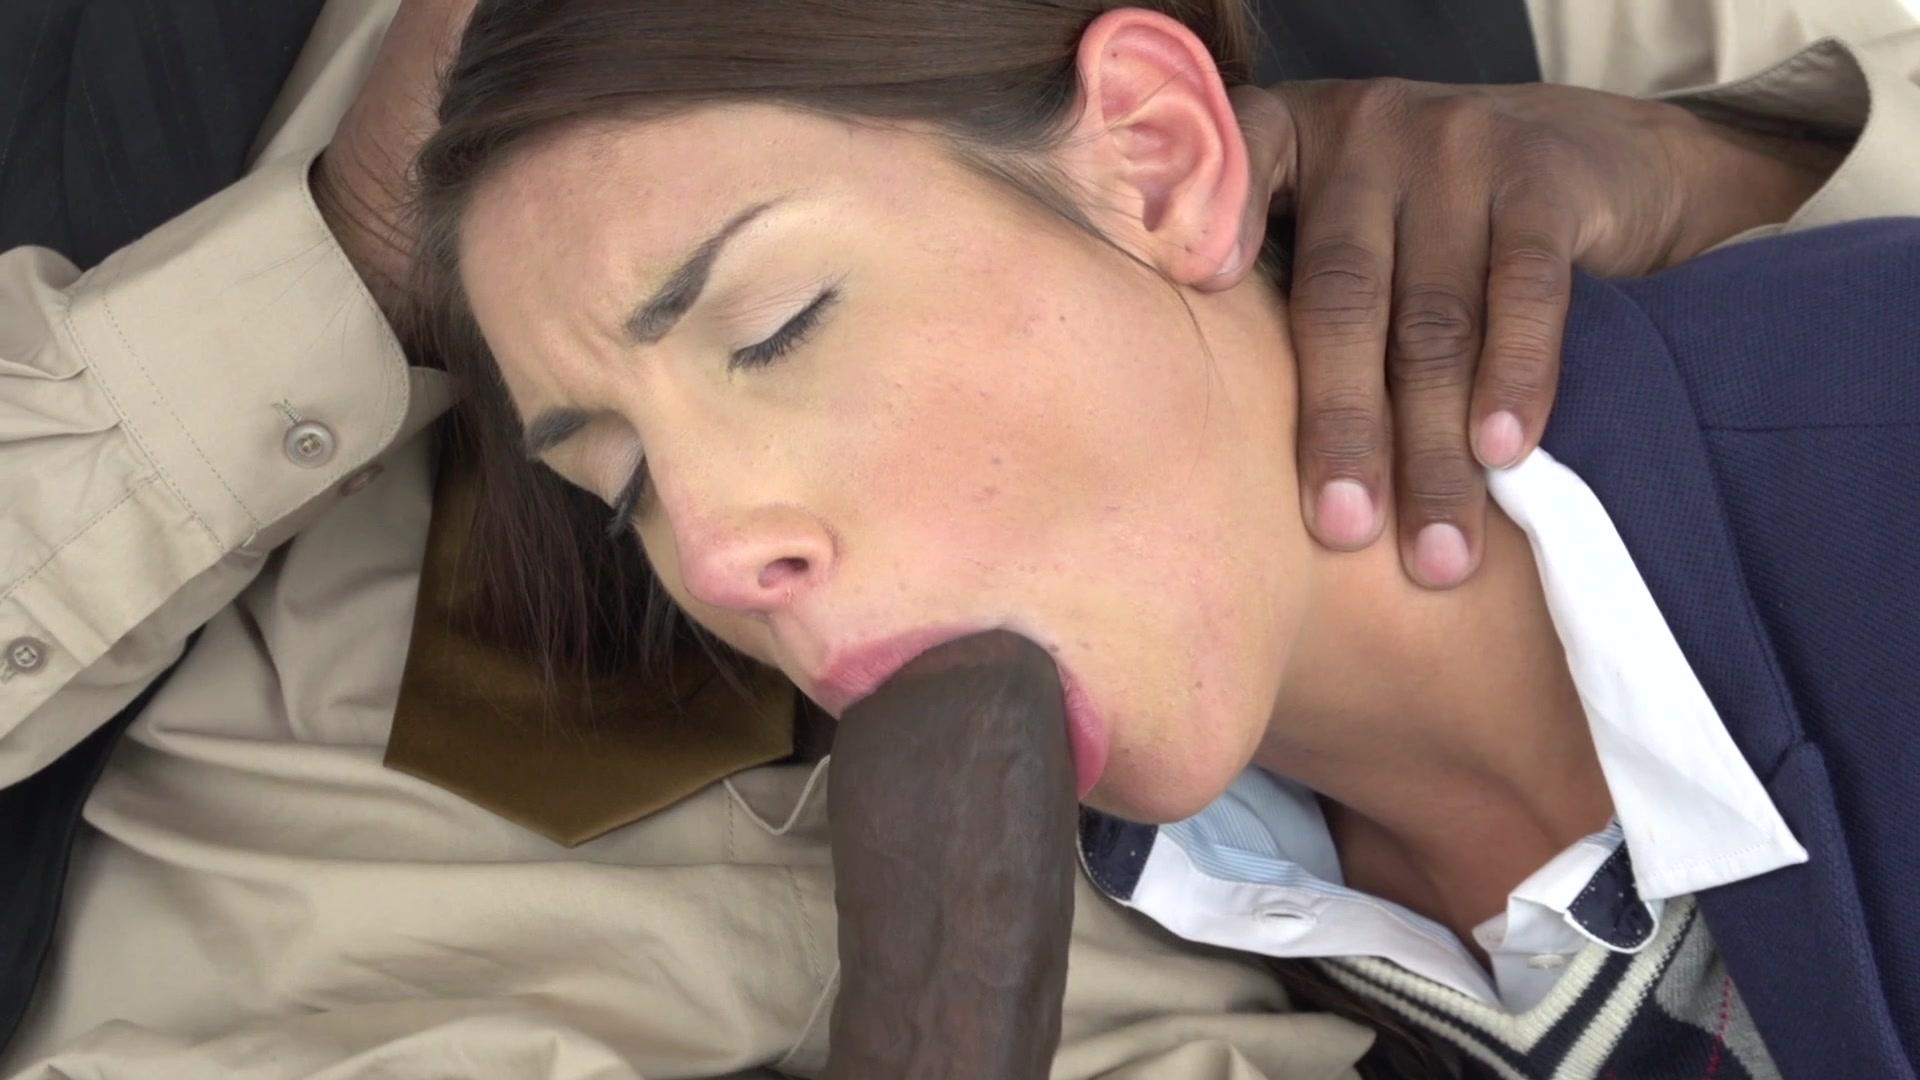 Kayla synz short hair anal dildo